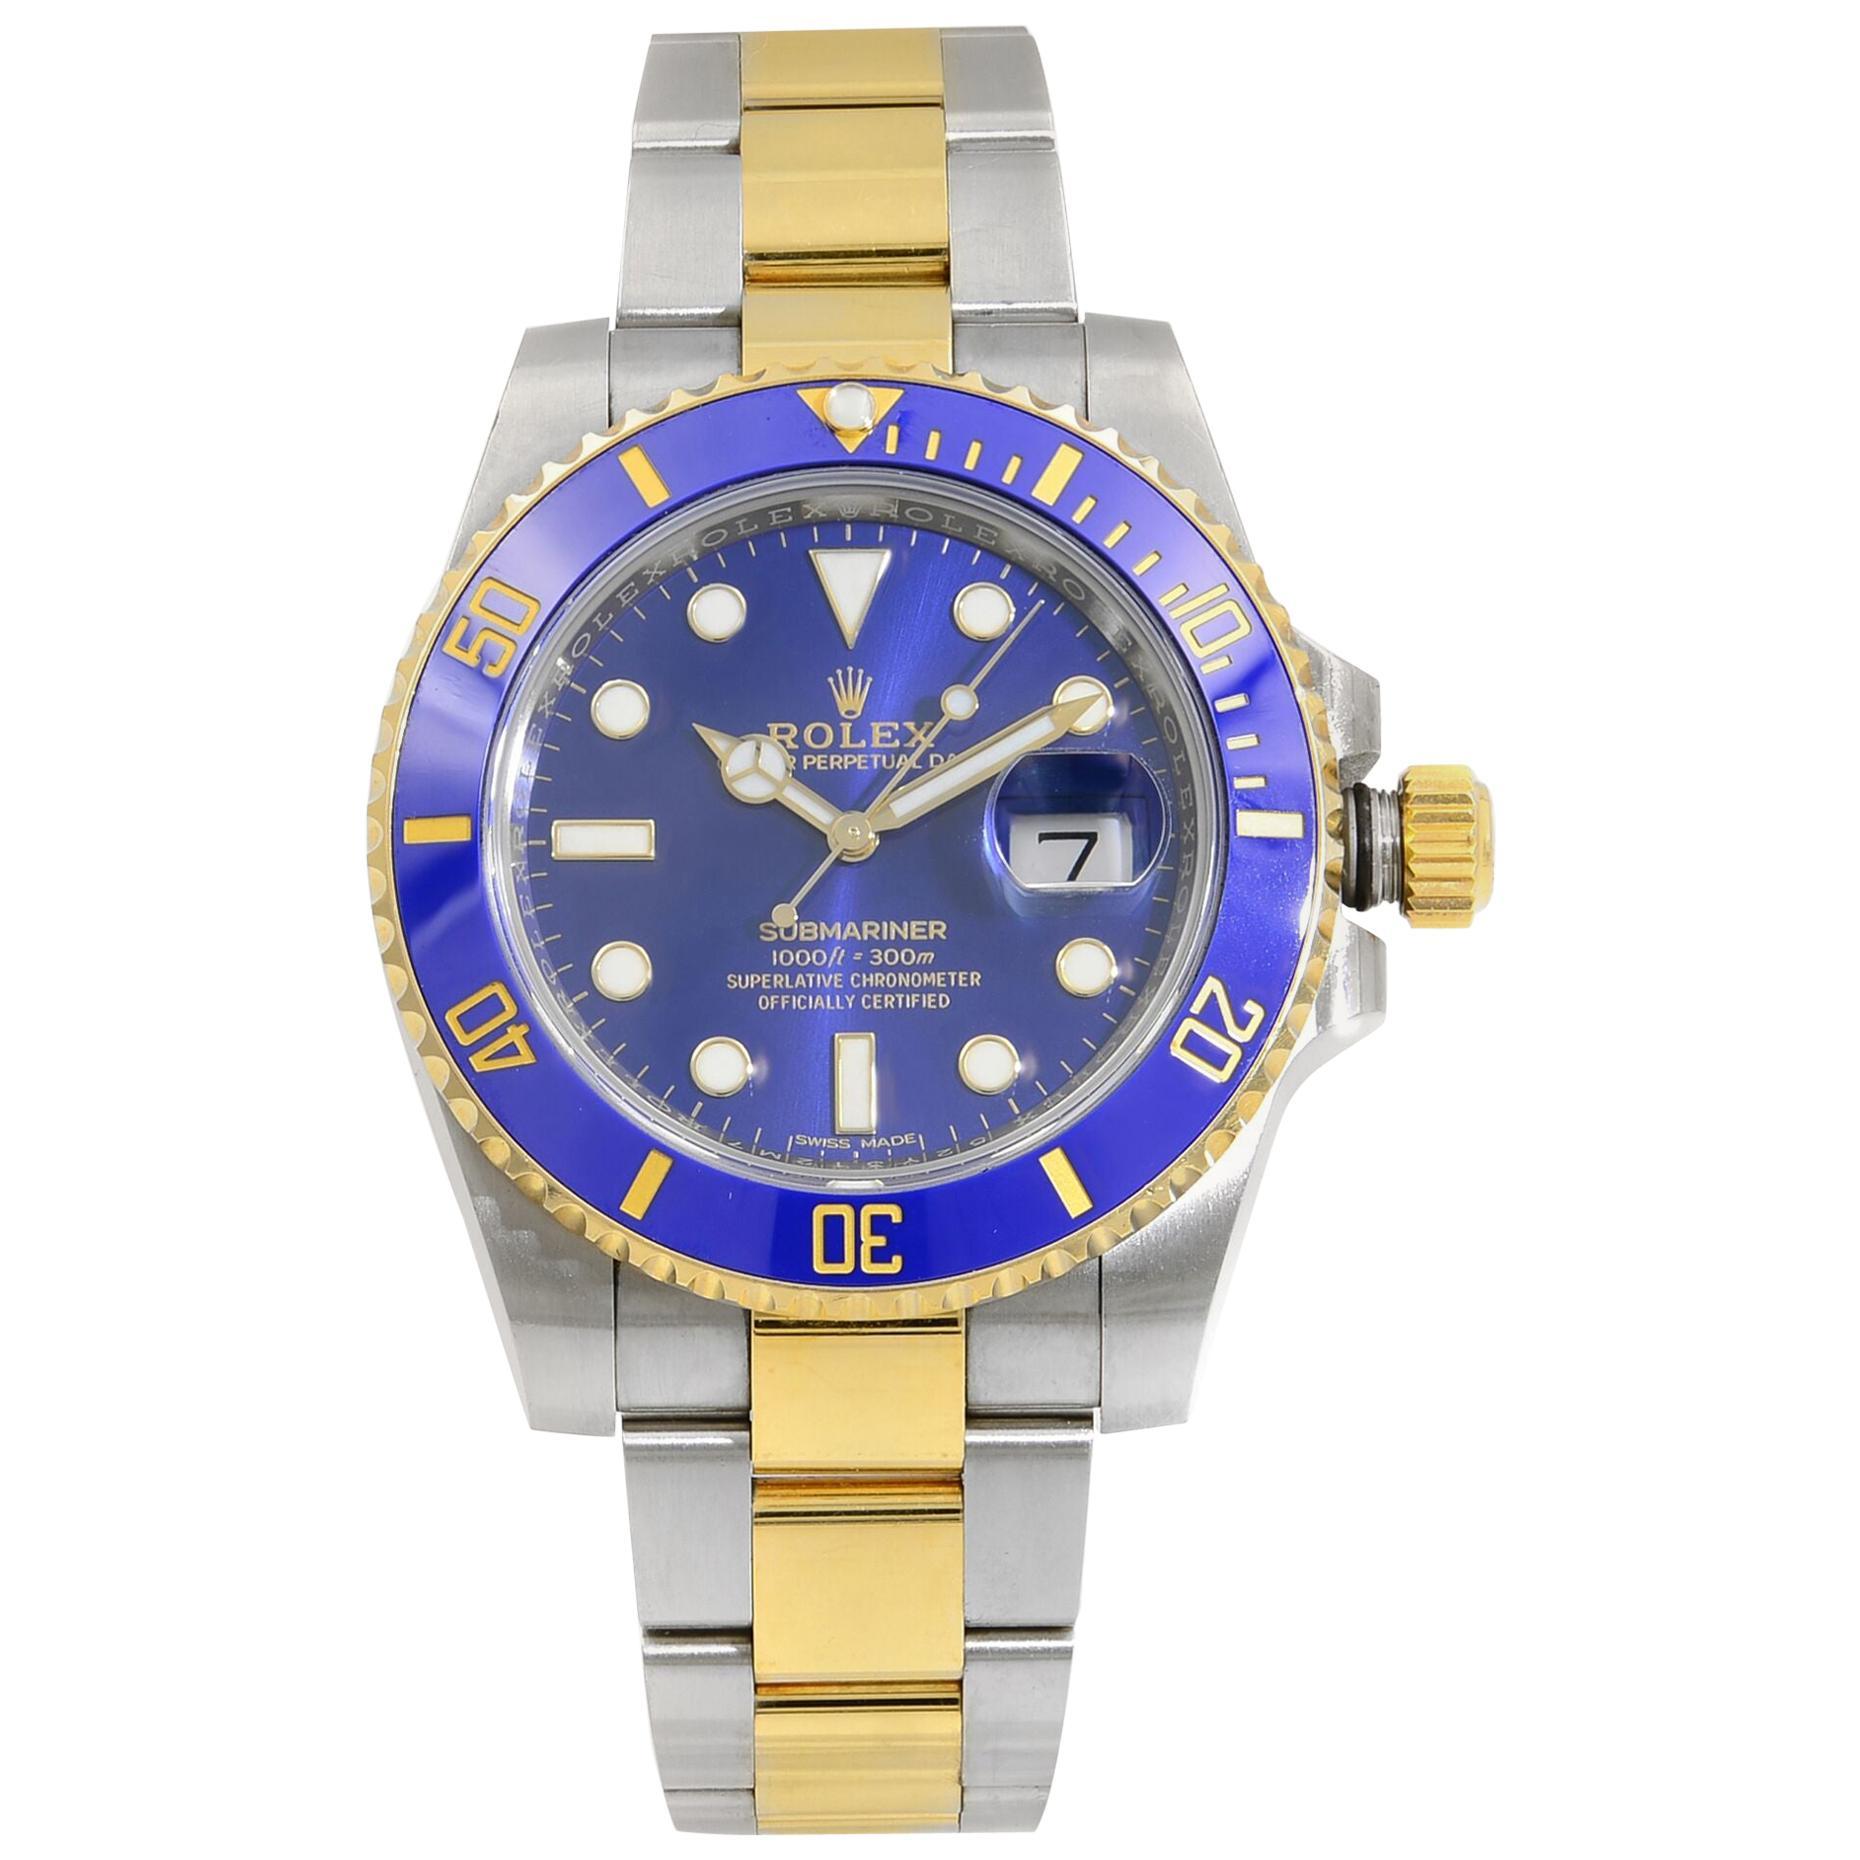 Rolex Submariner Date Steel 18 Karat Yellow Gold Blue Dial Men's Watch 116613LB